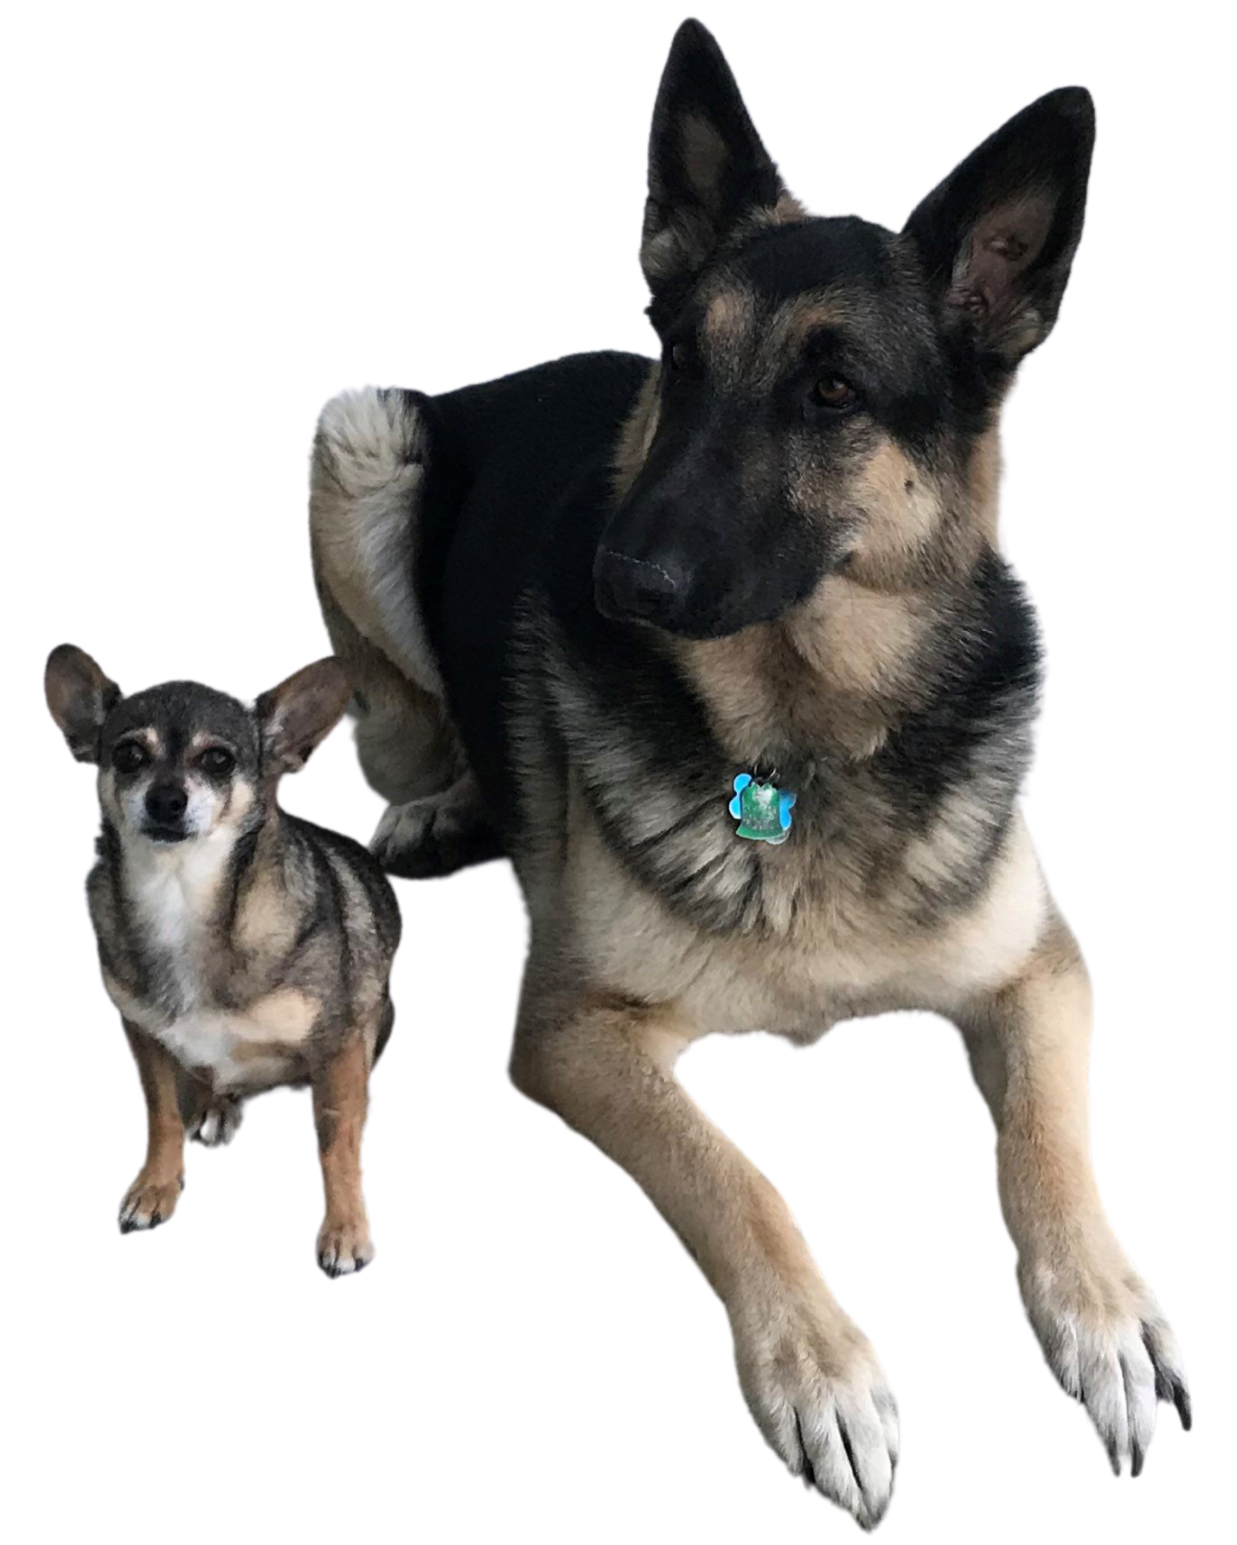 Bailey and Nala, Achieve Equine Staff